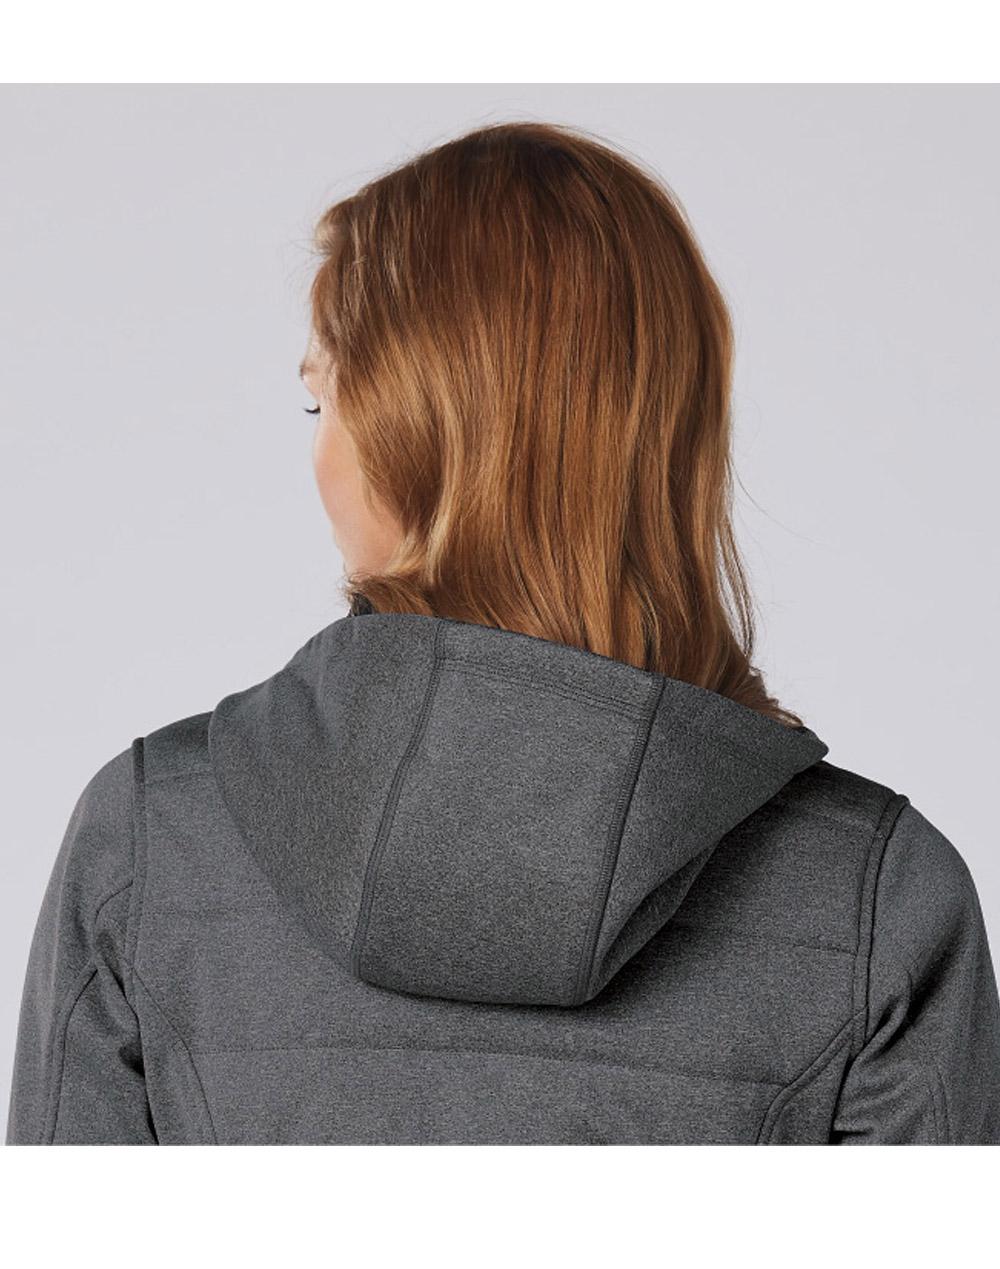 JK52 Jasper Cationic Quilted Jacket- Ladies